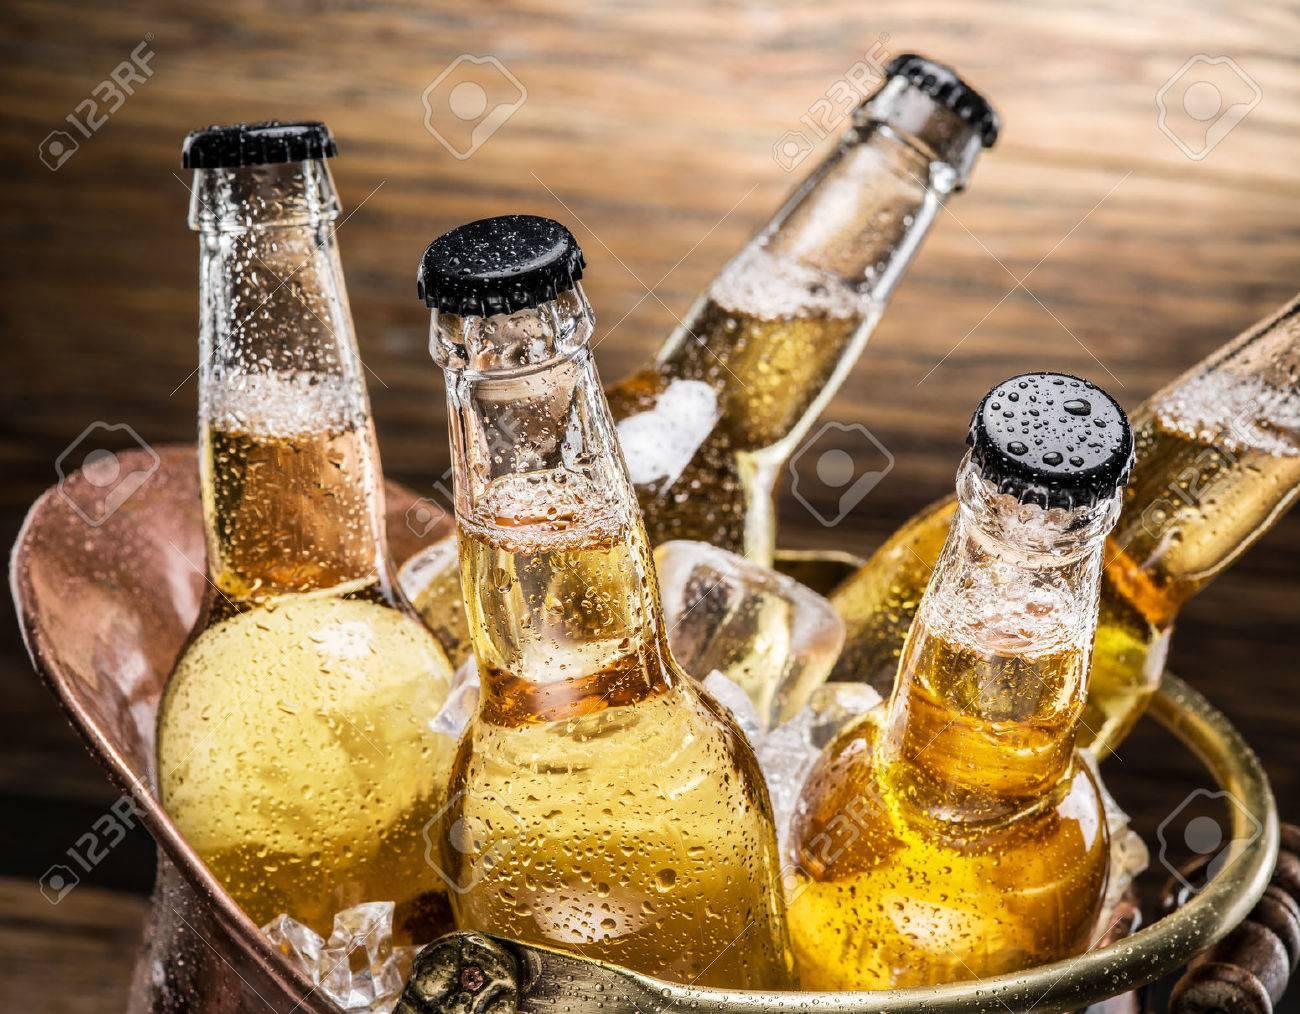 Cold bottles of beer in the brazen bucket on the wooden table. Standard-Bild - 53789489